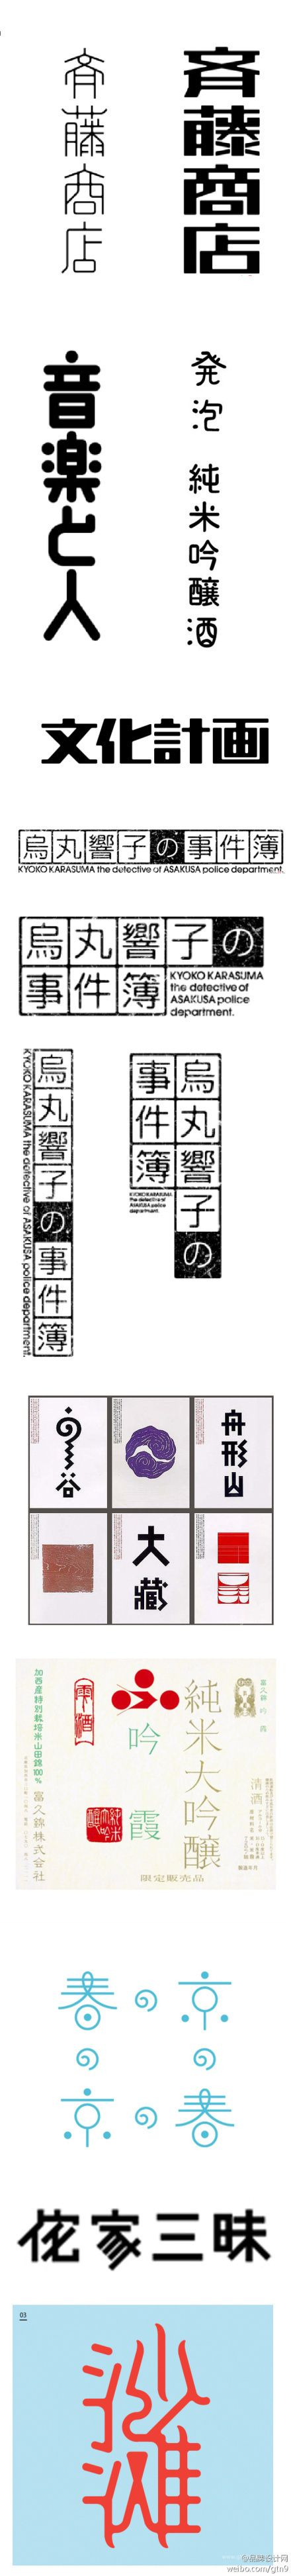 Chinese kanji - font variations - www.Kataaro.com